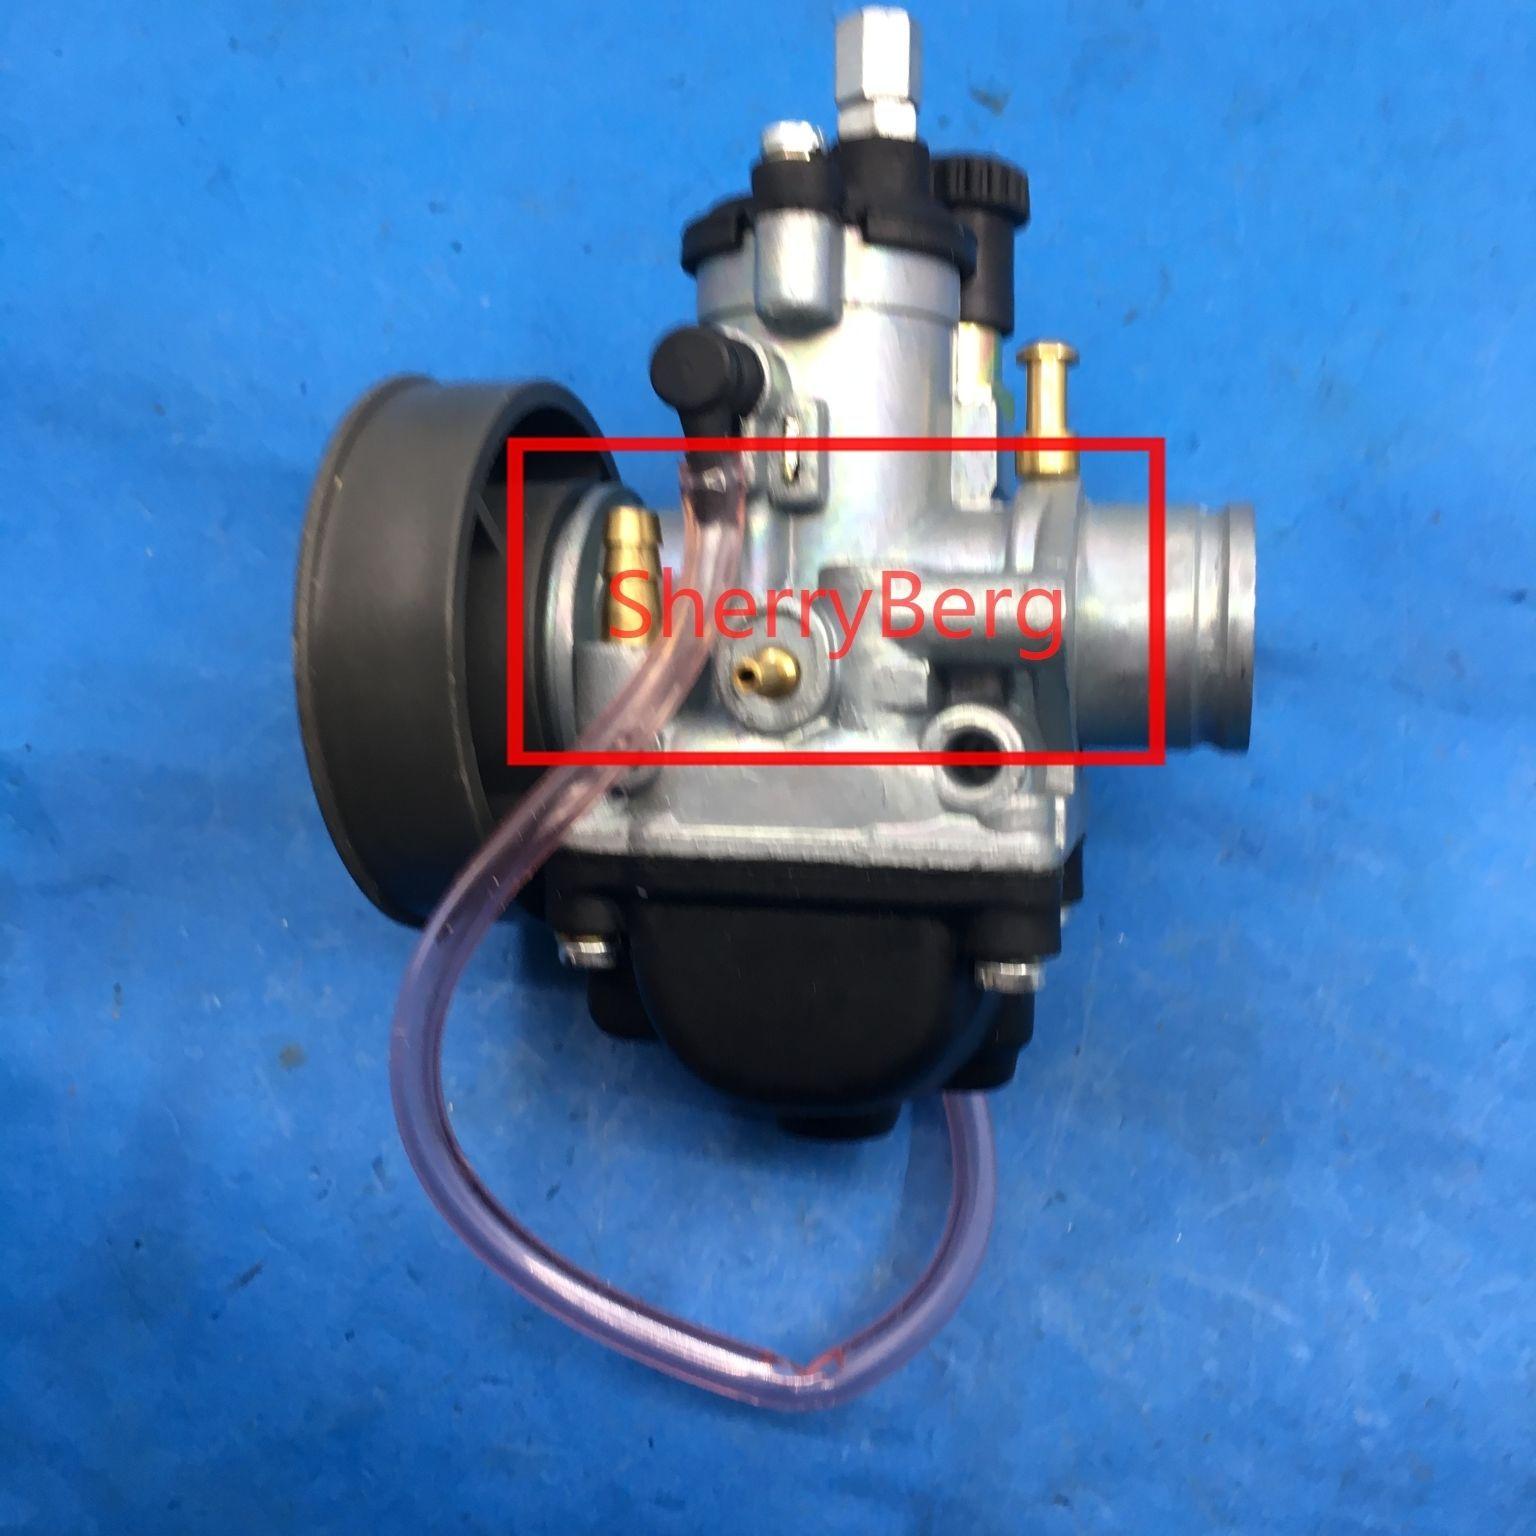 Carbu DELLORTO phbg 21 carburador Booster DELLORTO MODELO MBK Spirit YAMAHA Bws